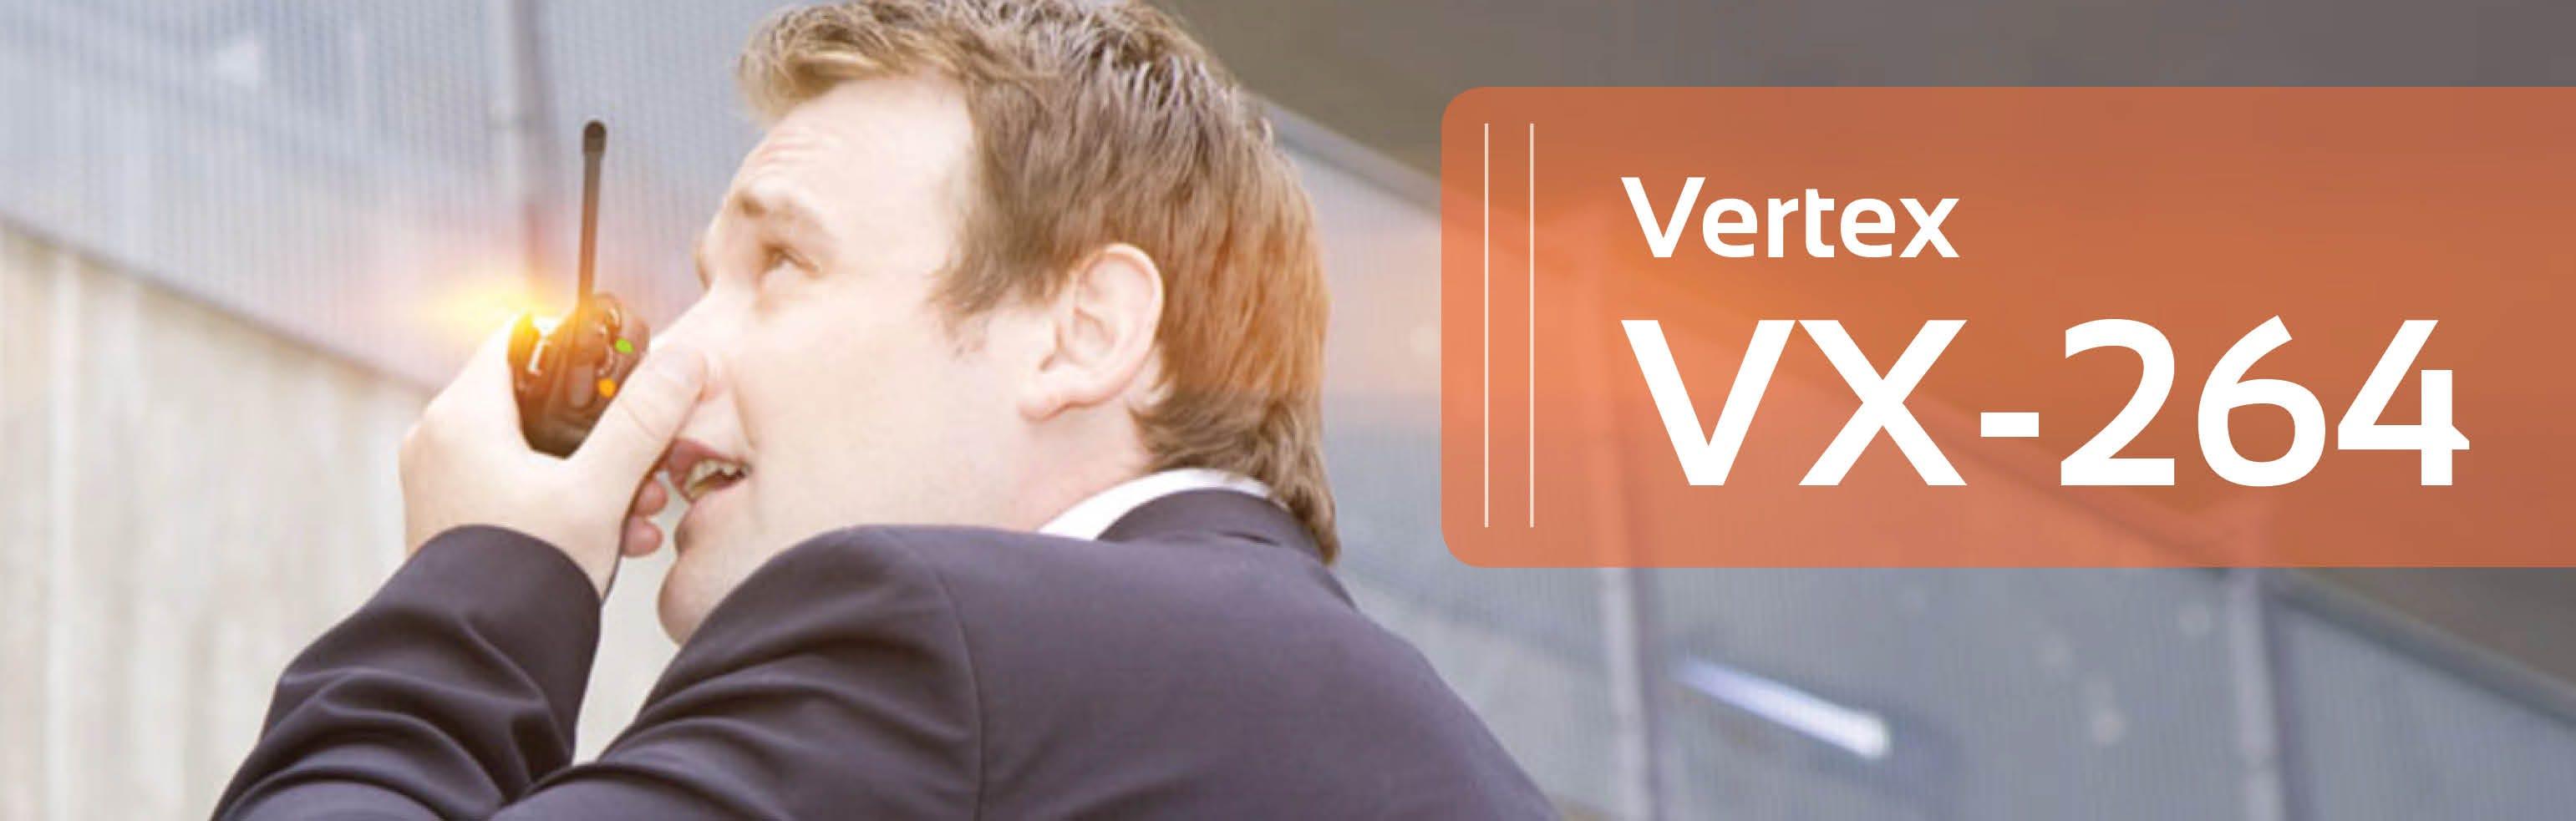 Vertex VX-264